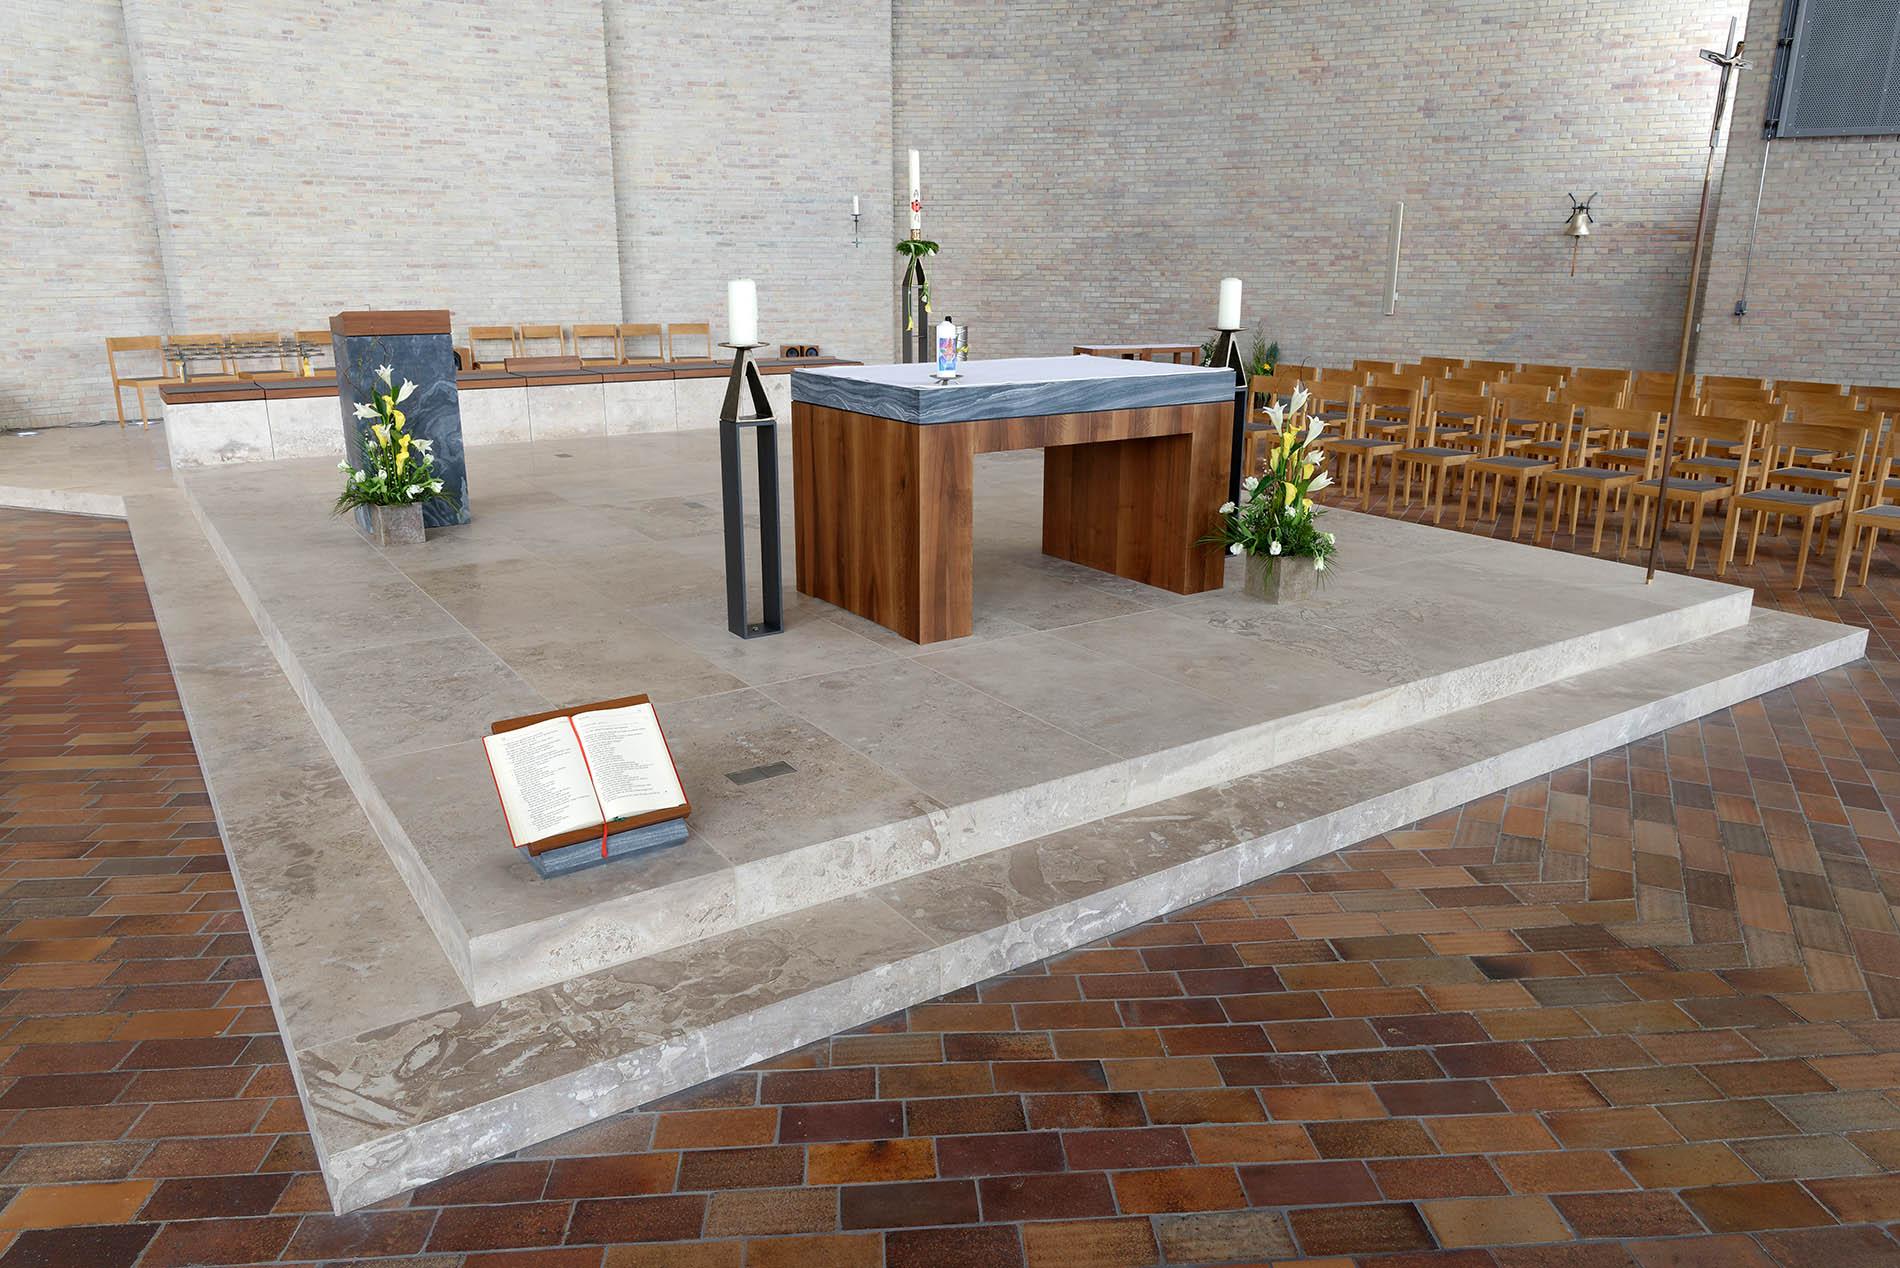 Karlsruhe Kirche St.Konrad - mit einem Naturstein - Altar aus TRACO-Travertin Sonderbuch